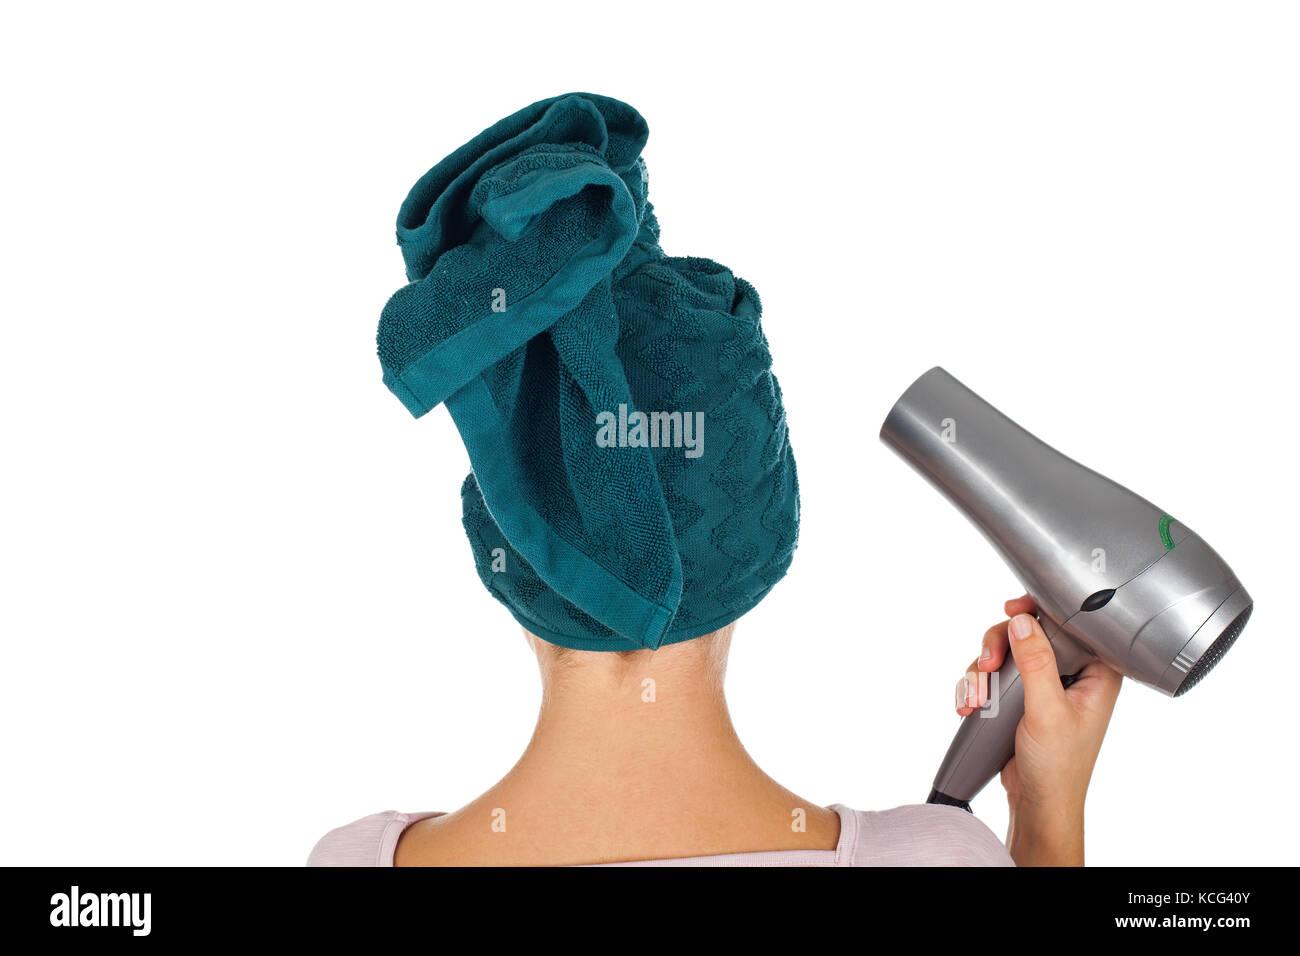 Сушилка для рук и волос easy dry автомат